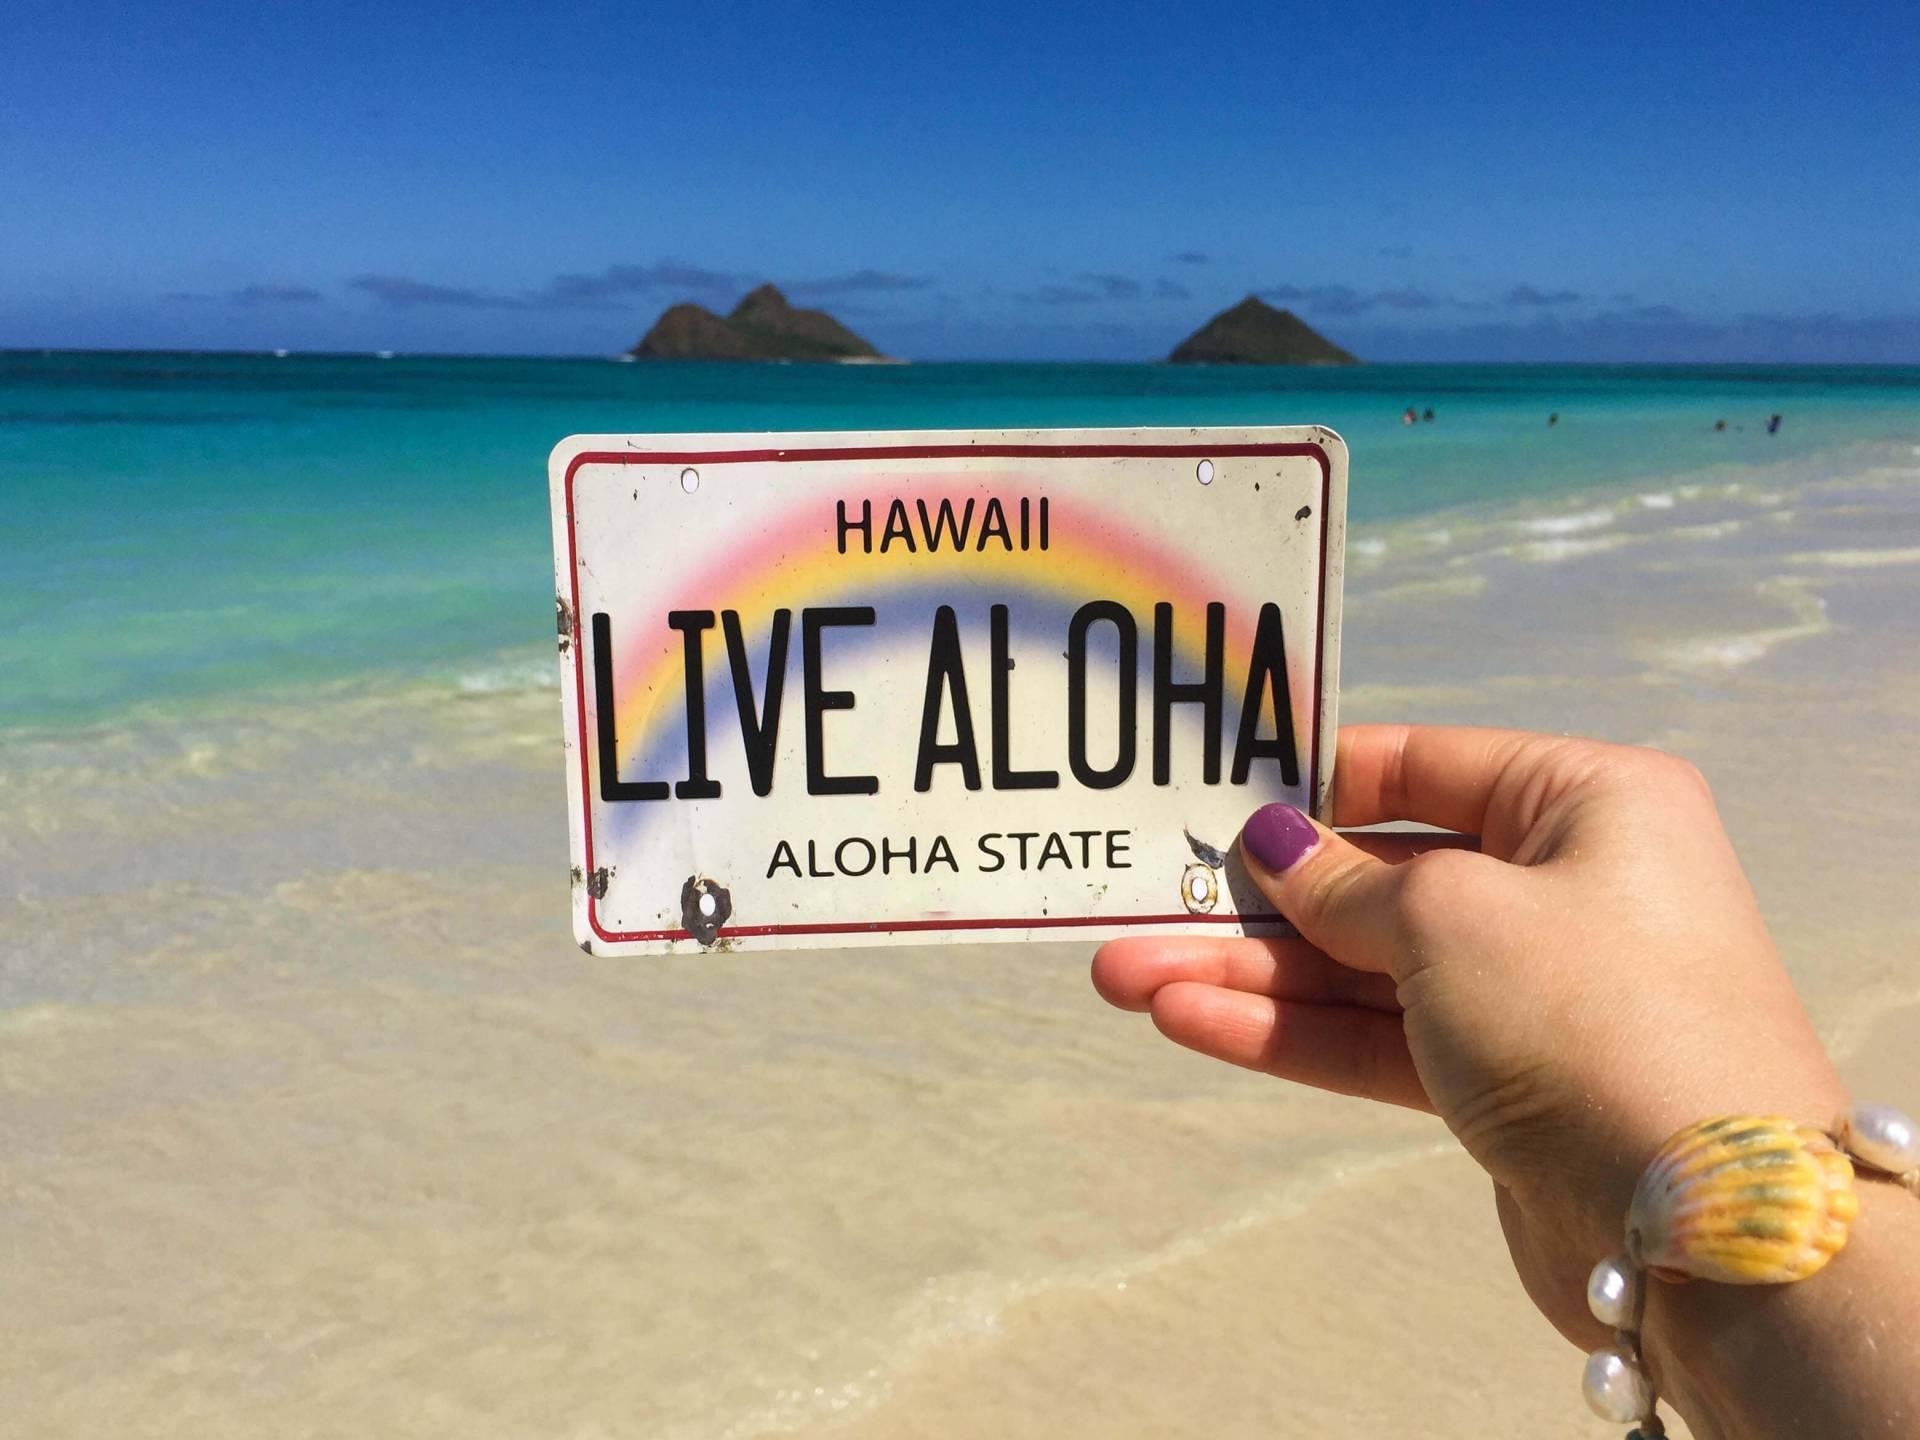 Live Aloha Postcard- photograph taken in front of the Mokes on Lani Kai Beach on Oahu